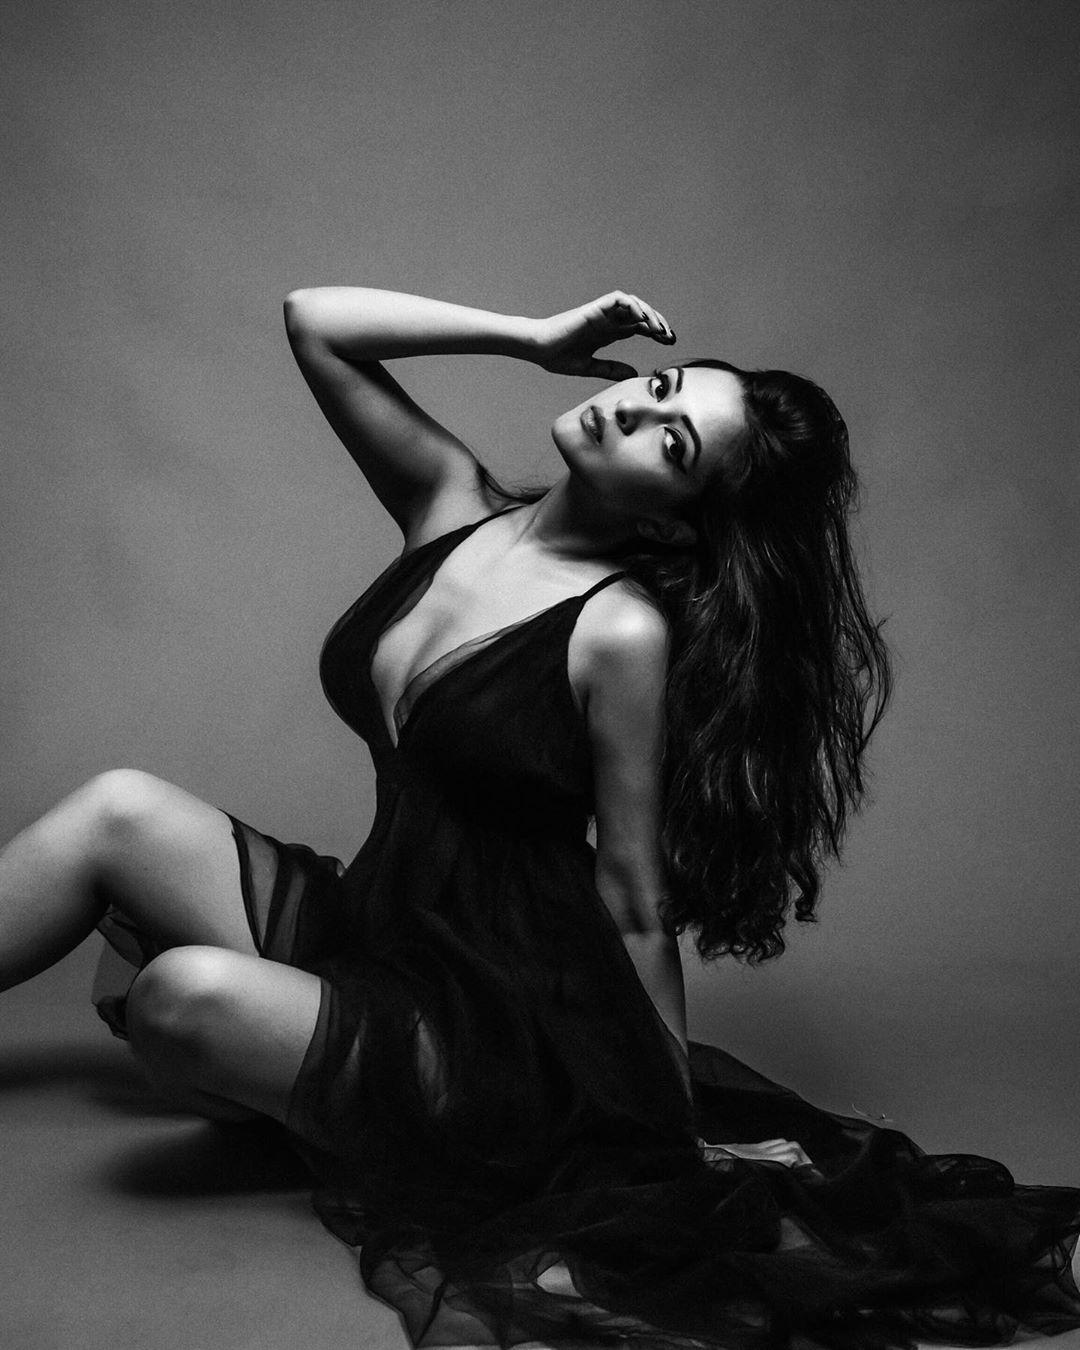 Bollywood Tadka,रिया सेन इमेज,रिया सेन फोटो, रिया सेन पिक्चर